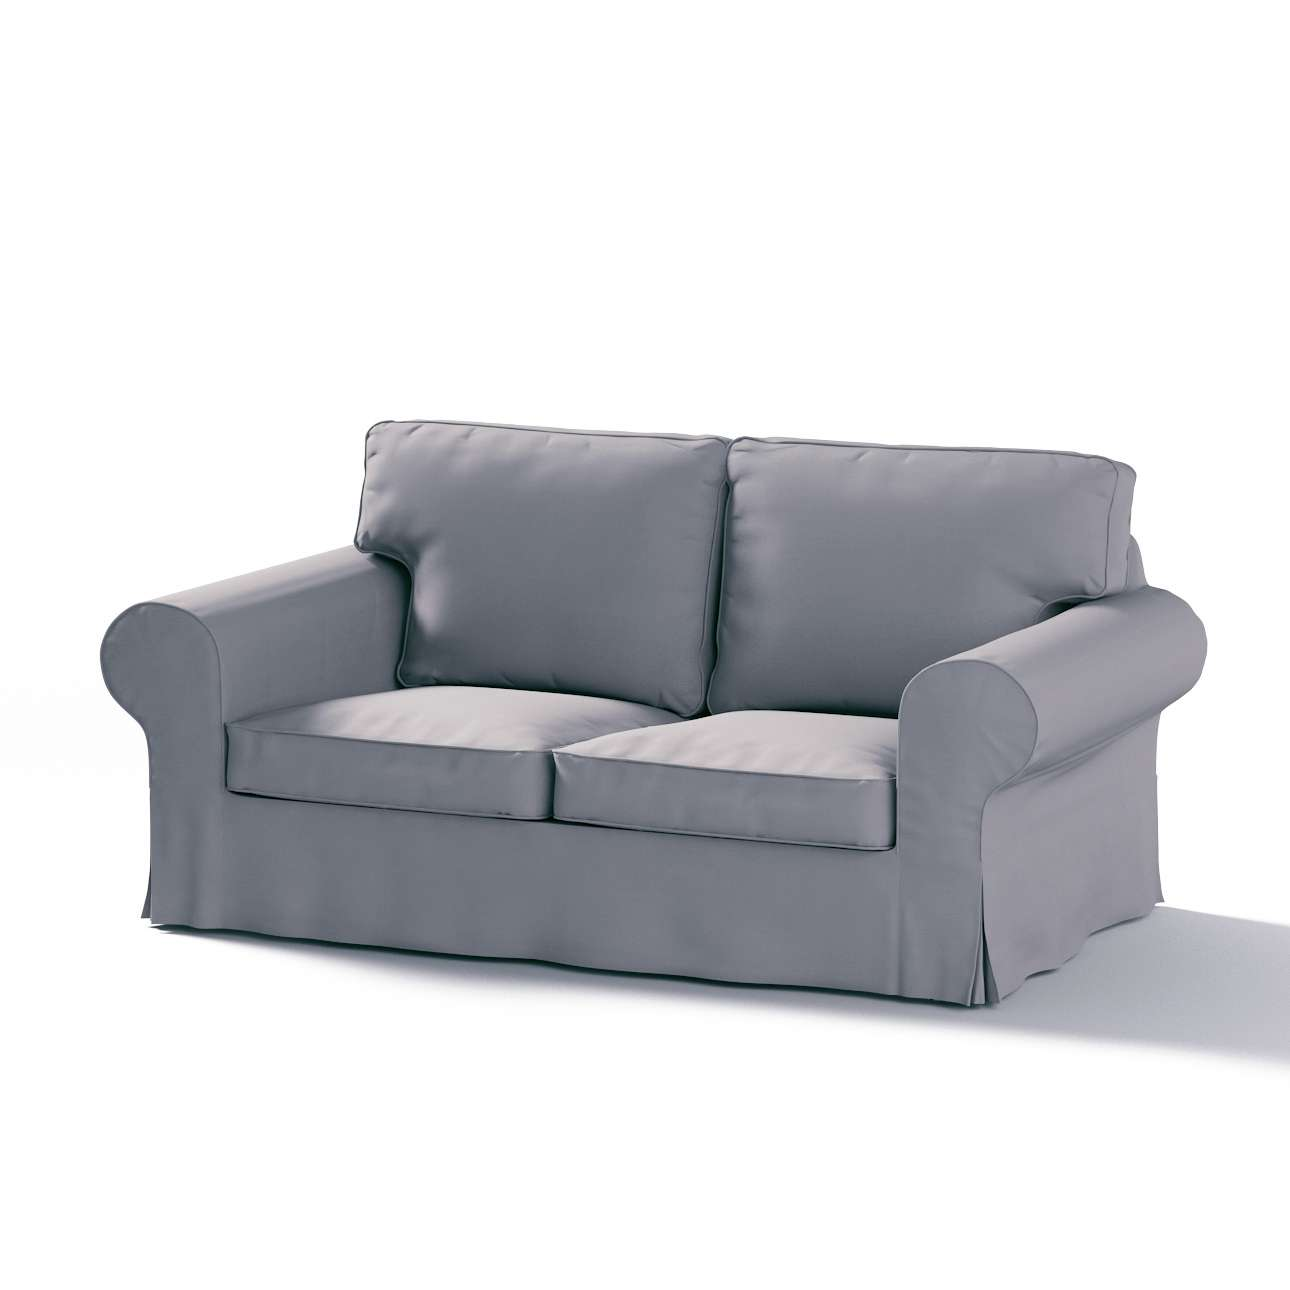 Ektorp 2 sæder sovesofa gammel model<br/>Bredde ca 195cm Betræk uden sofa fra kollektionen Cotton Panama, Stof: 702-07